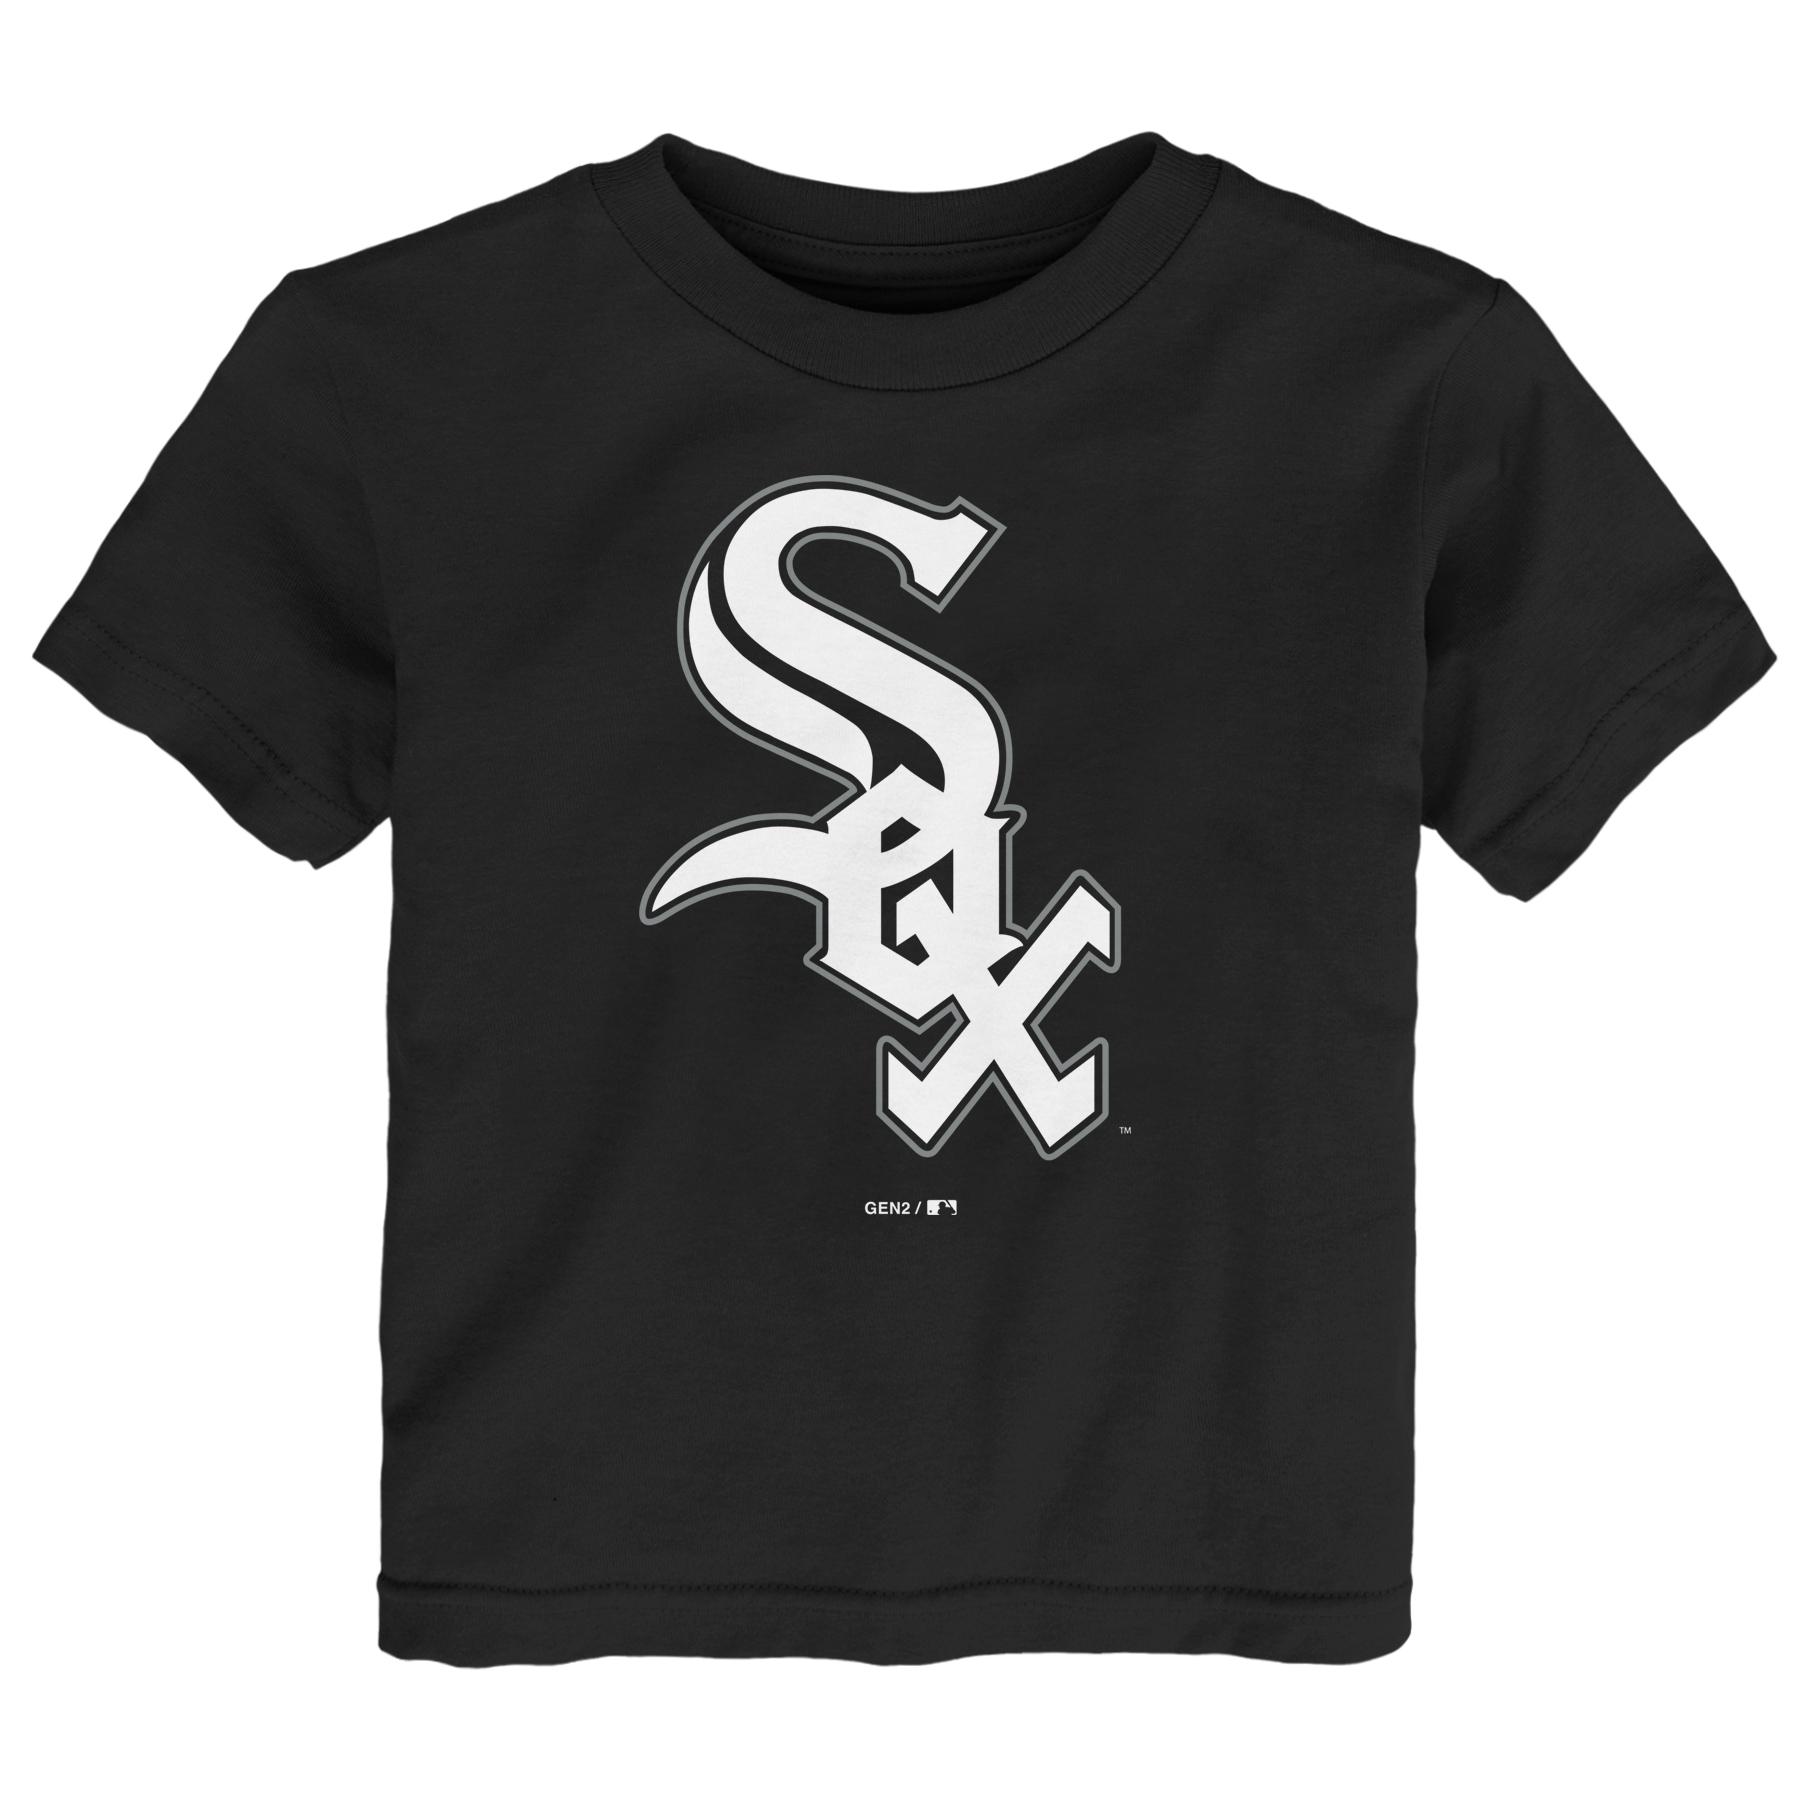 Chicago White Sox Toddler Primary Logo T-Shirt - Black